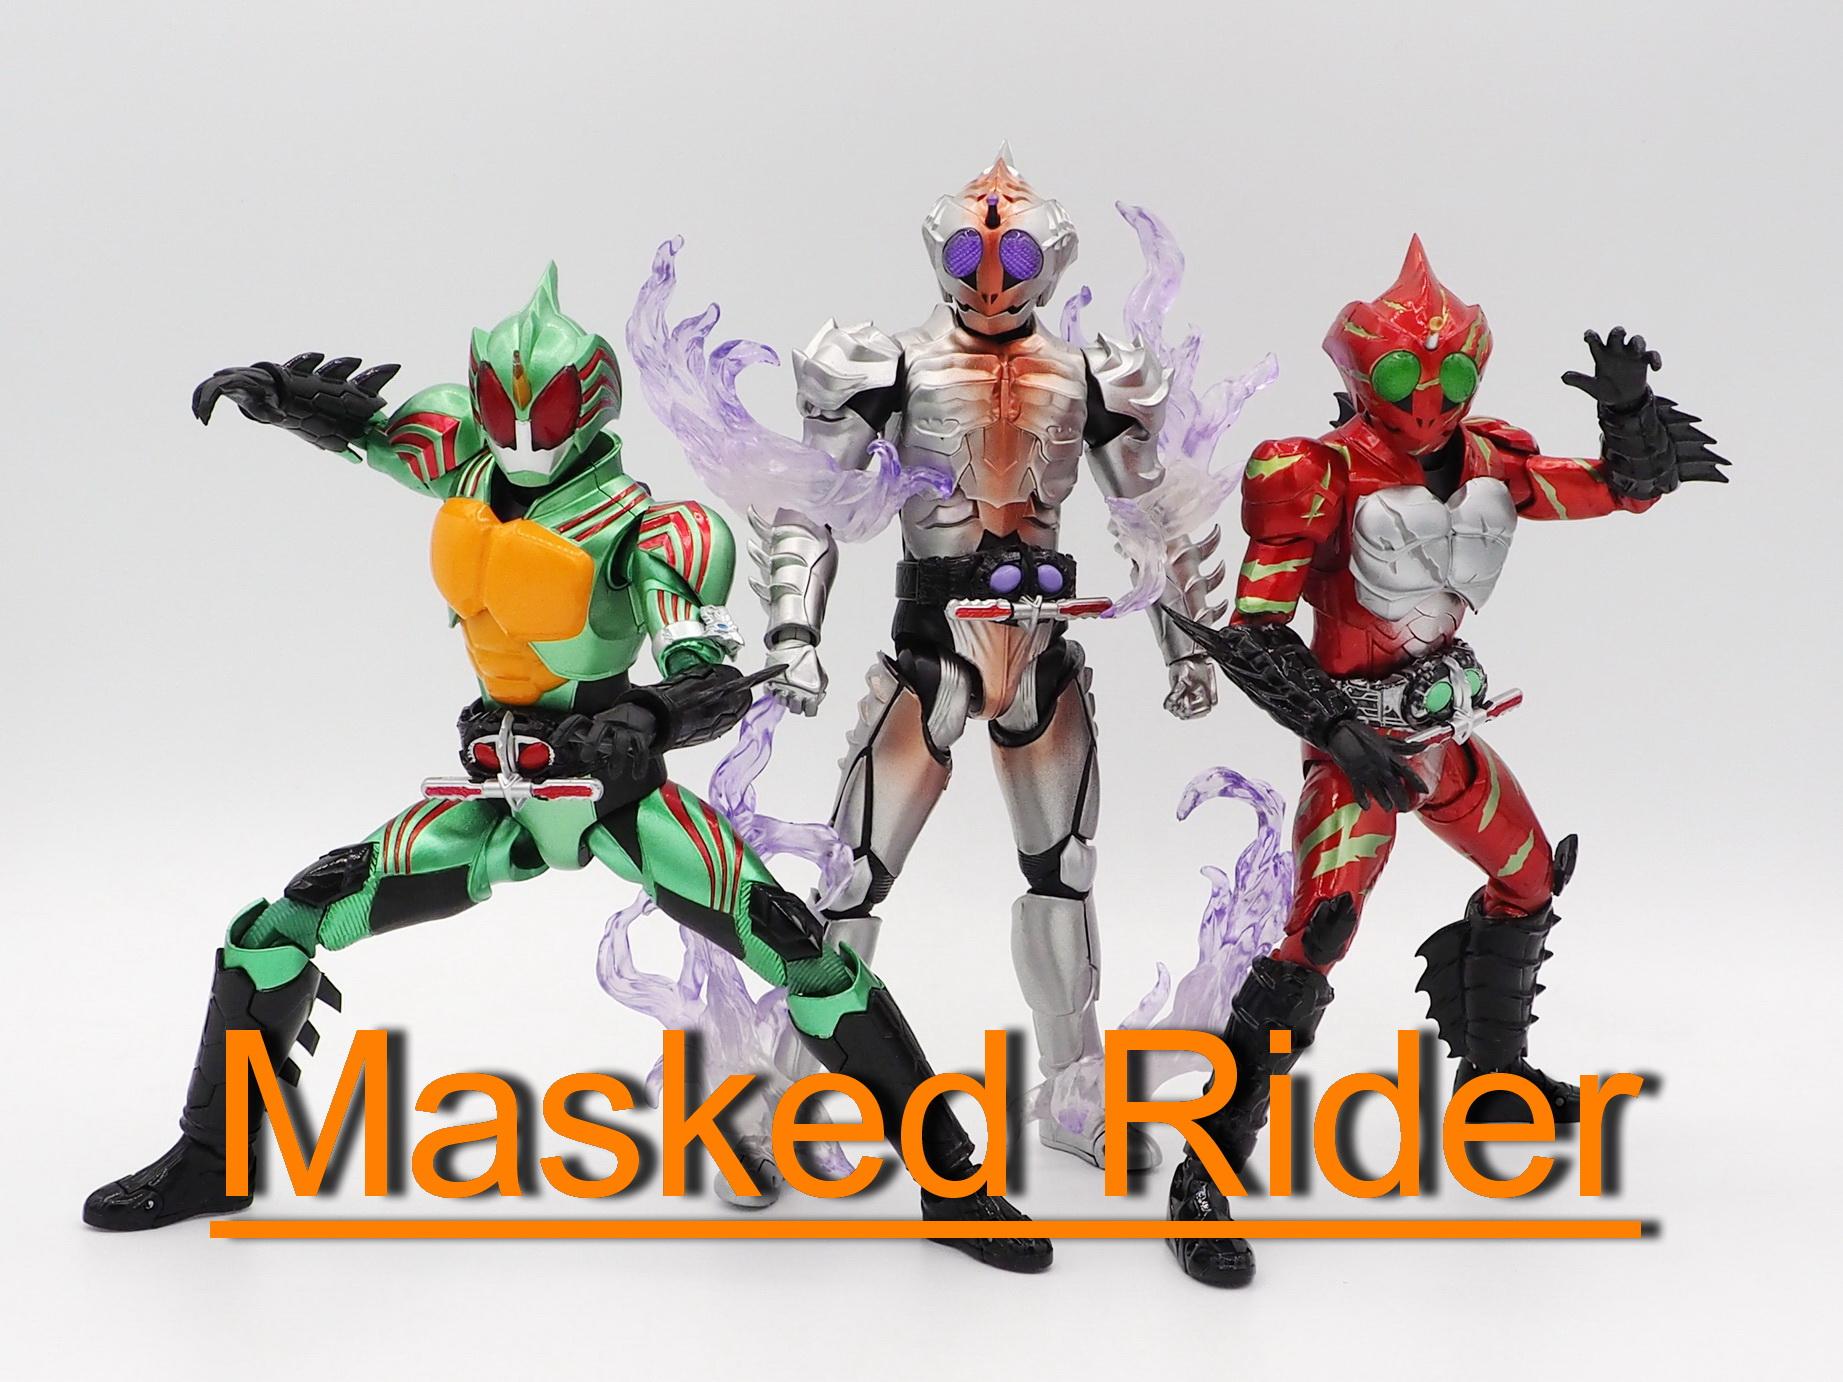 Masker rider